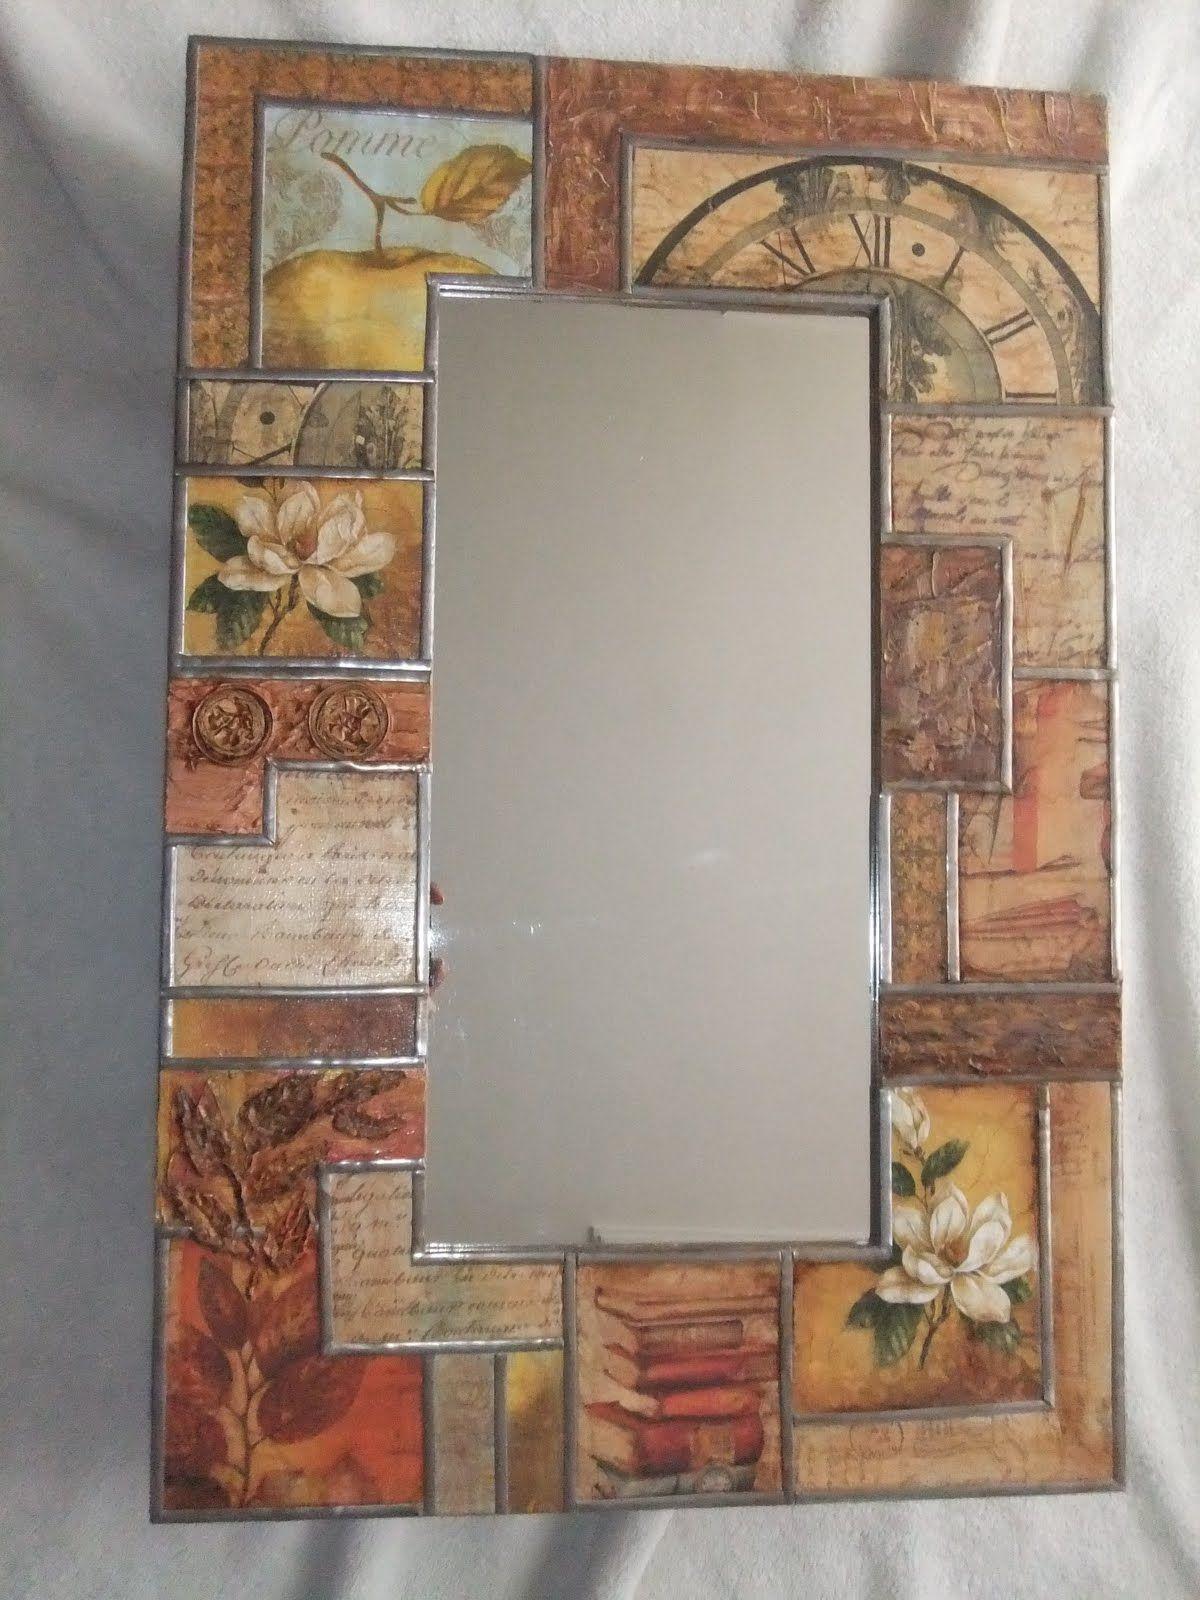 Marcos de espejo modernos buscar con google ideas t for Marcos de espejos modernos